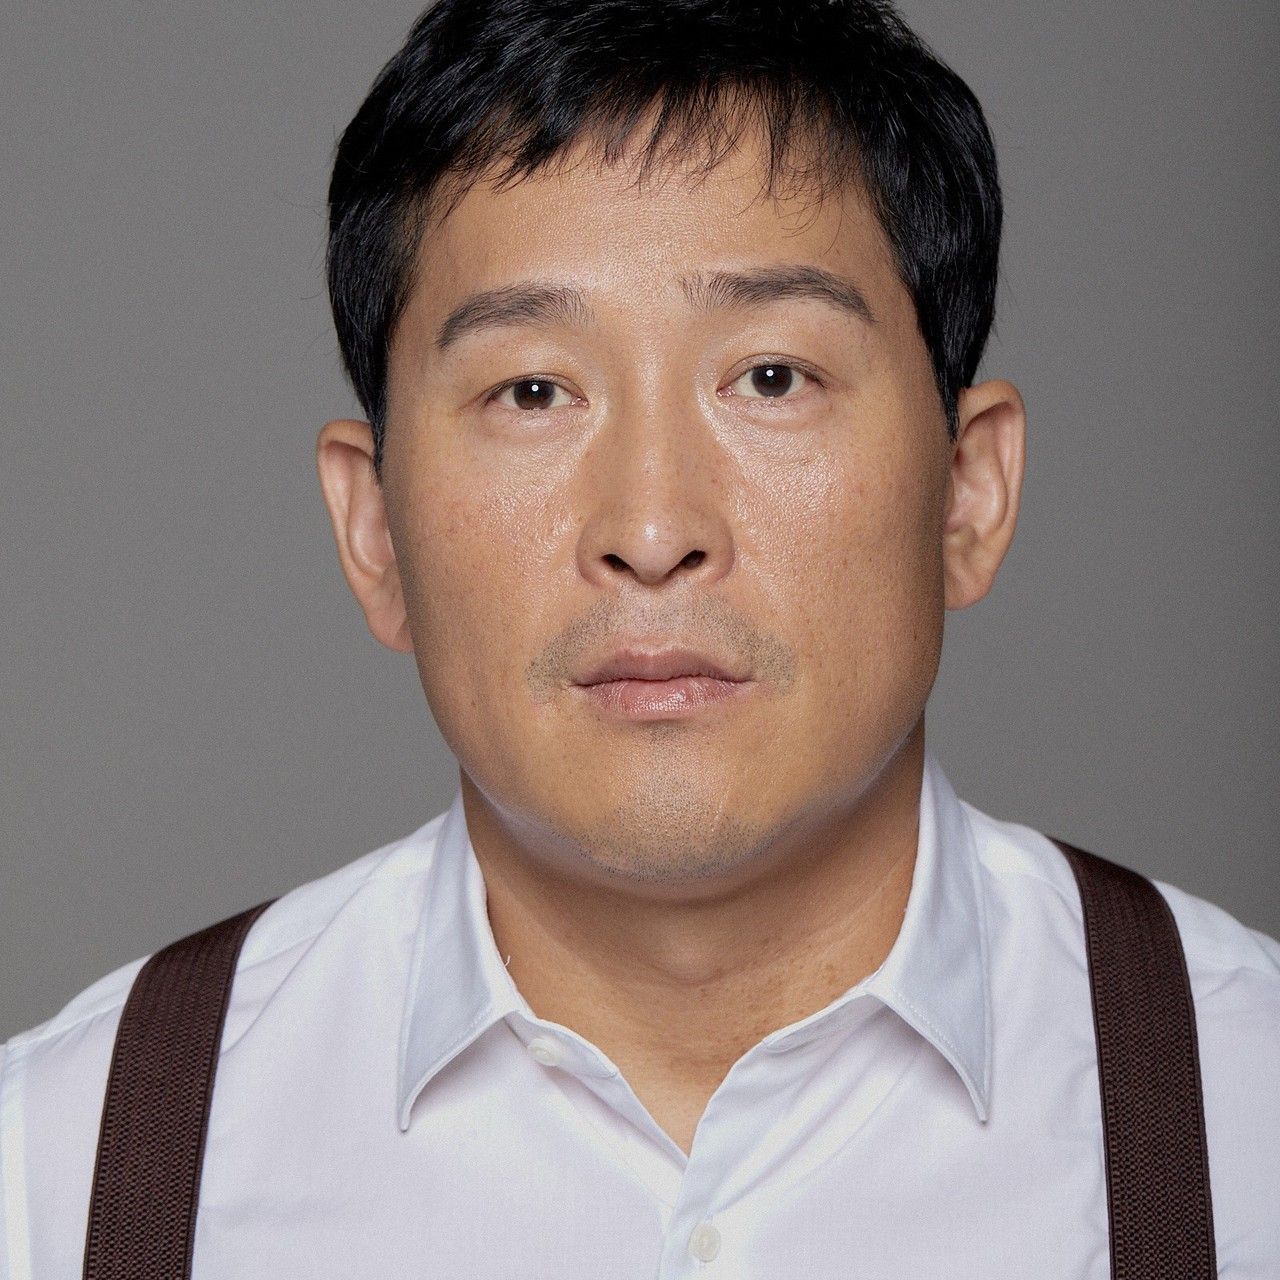 <b>조현우<br>Jo Hyun Wu</b>